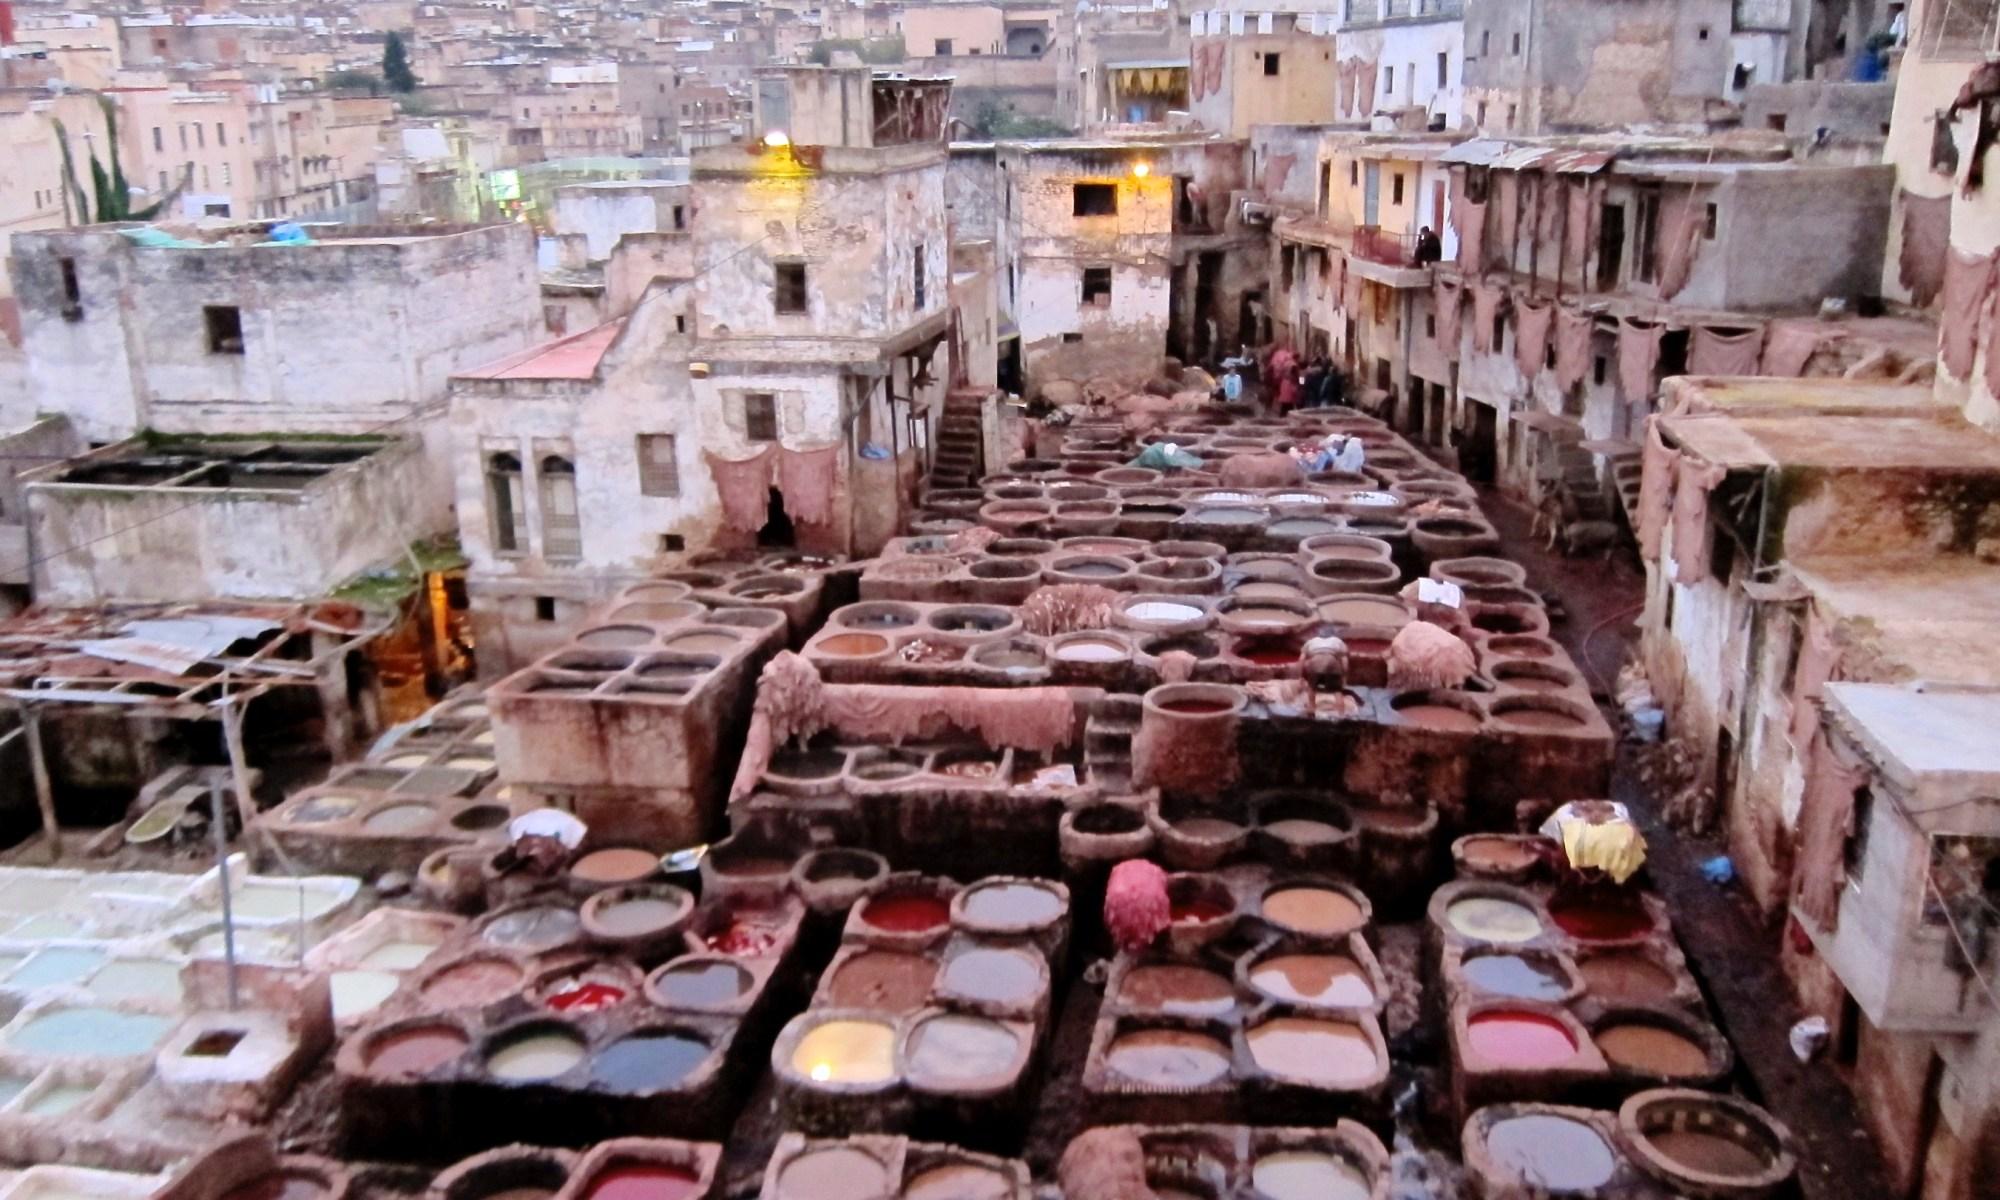 top 5 souvenirs to bring home from morocco xenos